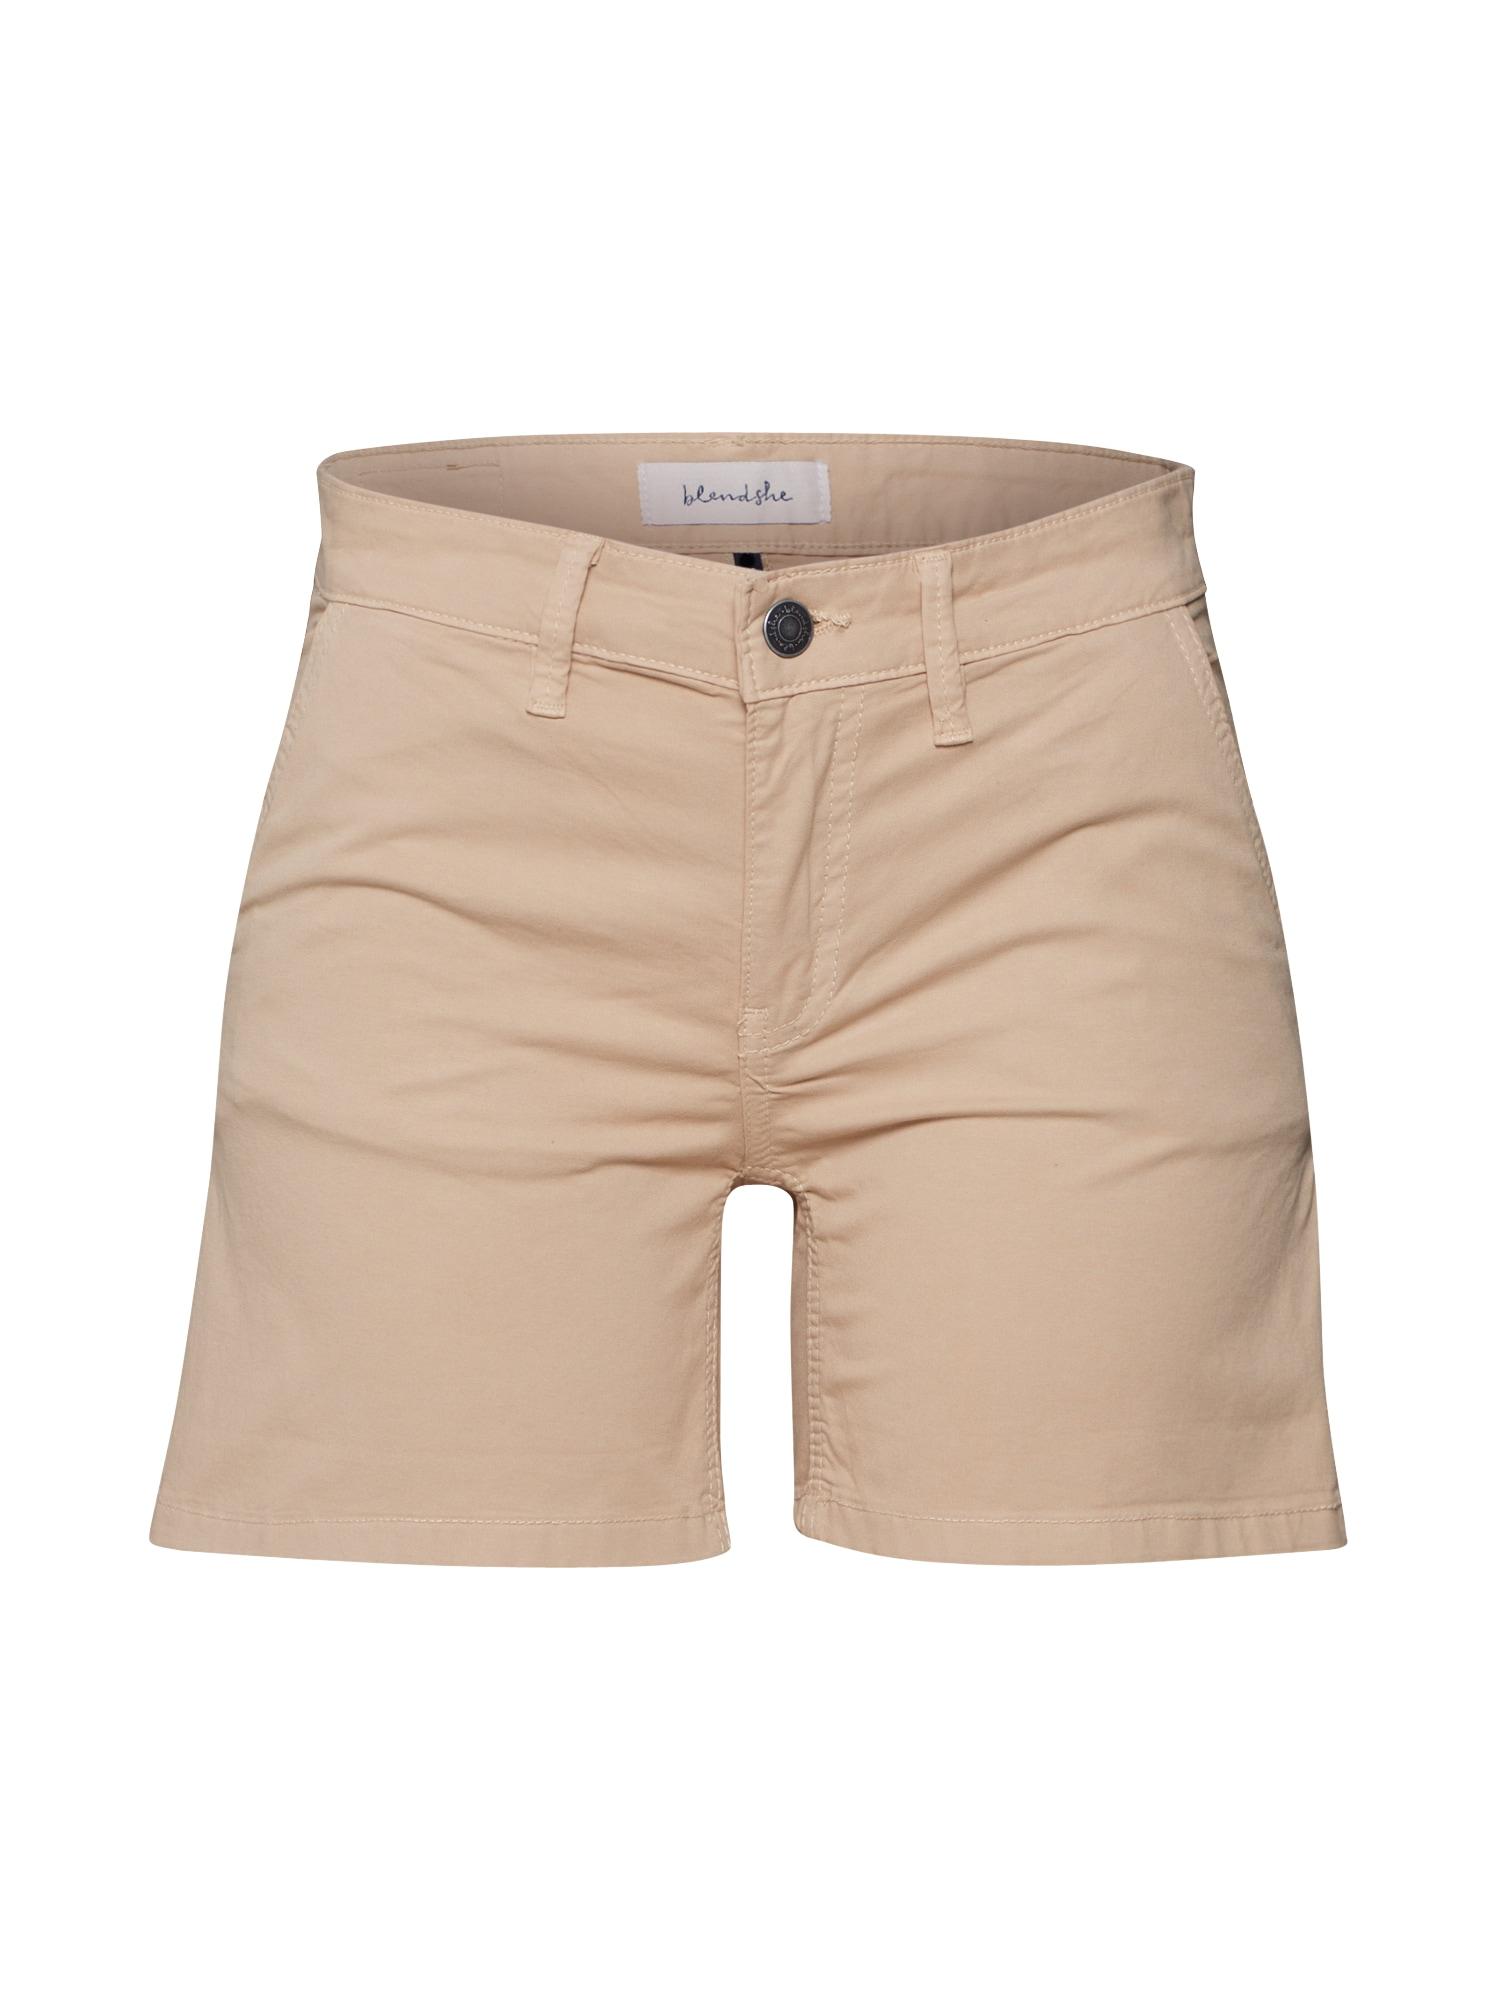 Blend She Chino stiliaus kelnės 'MALLE' smėlio